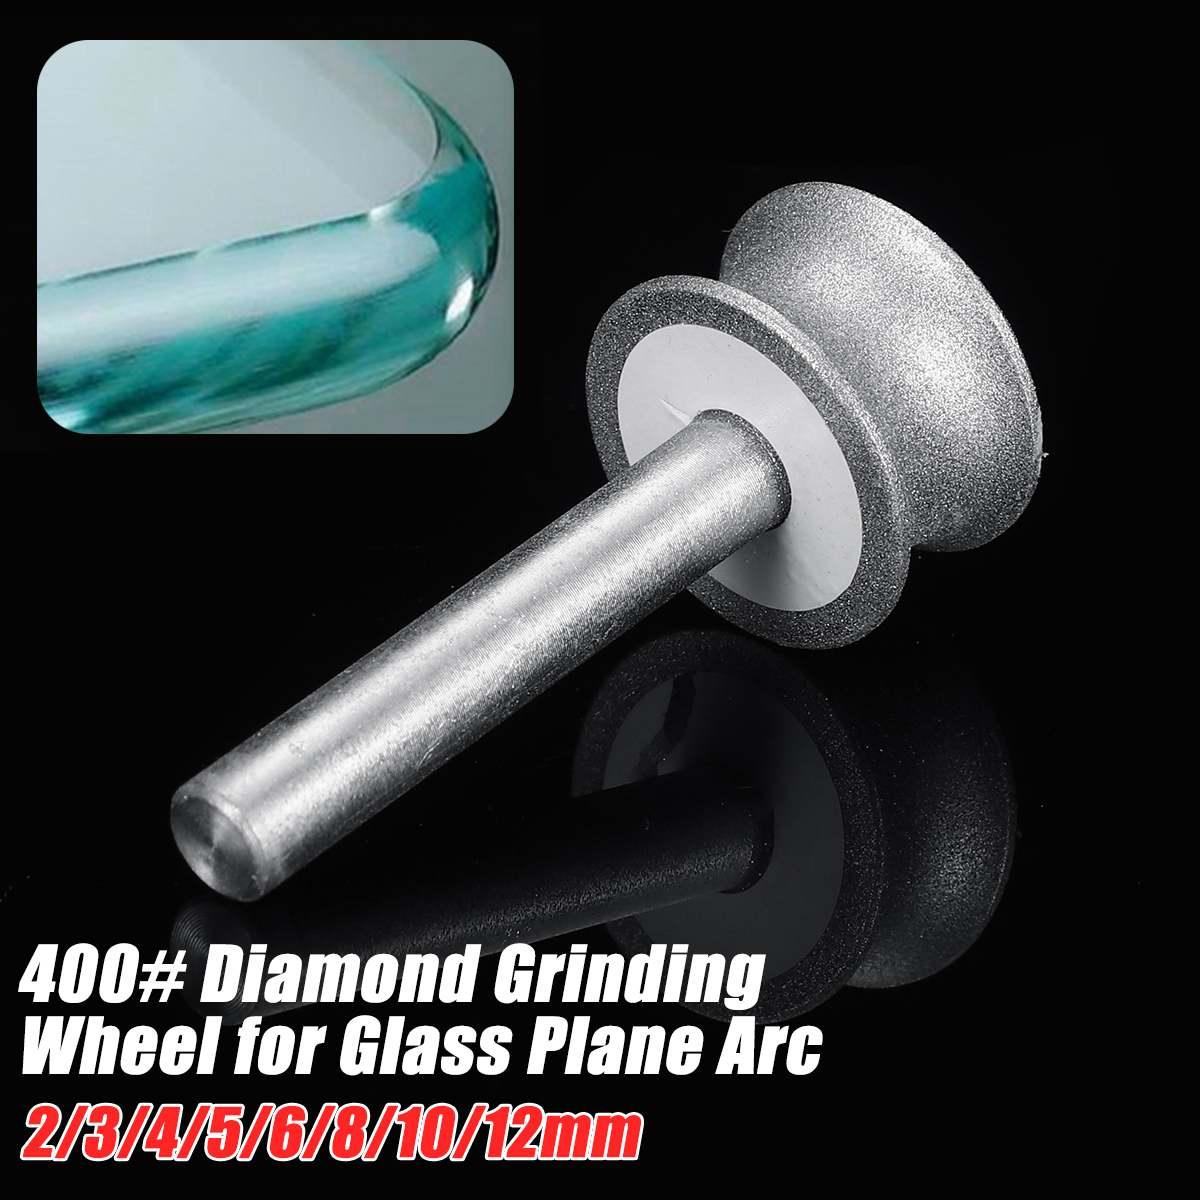 New 3-12mm Diamond Grinding Wheel Grinding Wheel for Glass Airplane Straight Edge Chamfer 6mm Shank Diamond Grinding Wheel